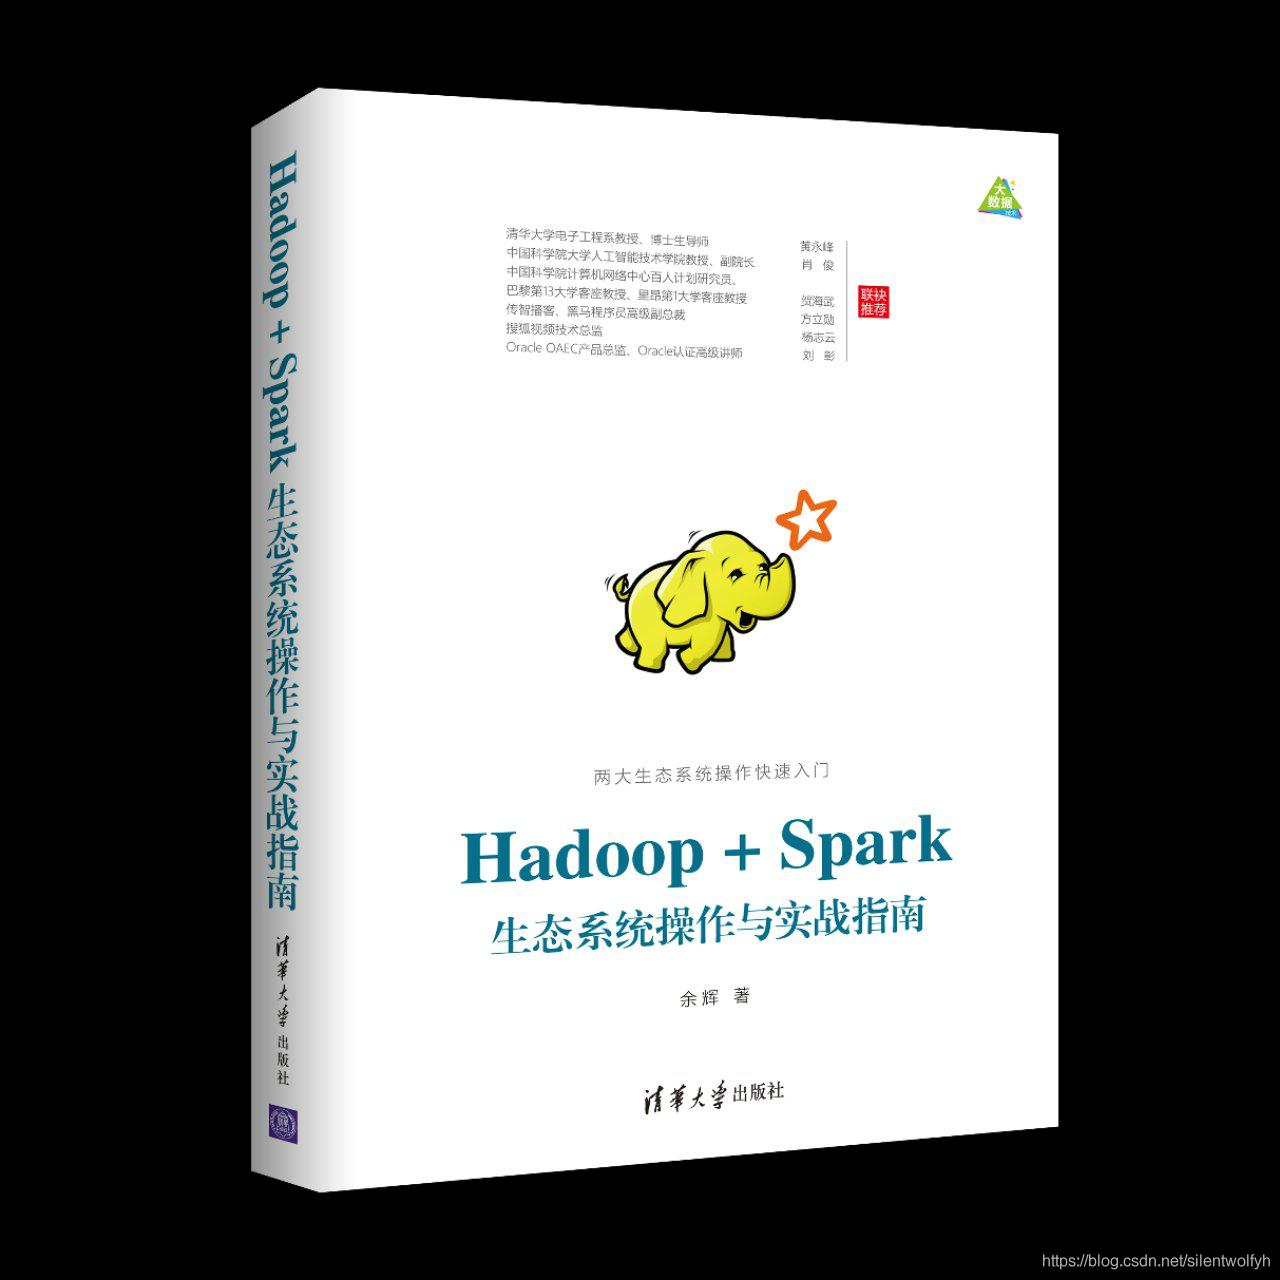 《Hadoop Spark生态系统操作与实战指南》高清带目录PDF电子书下载插图